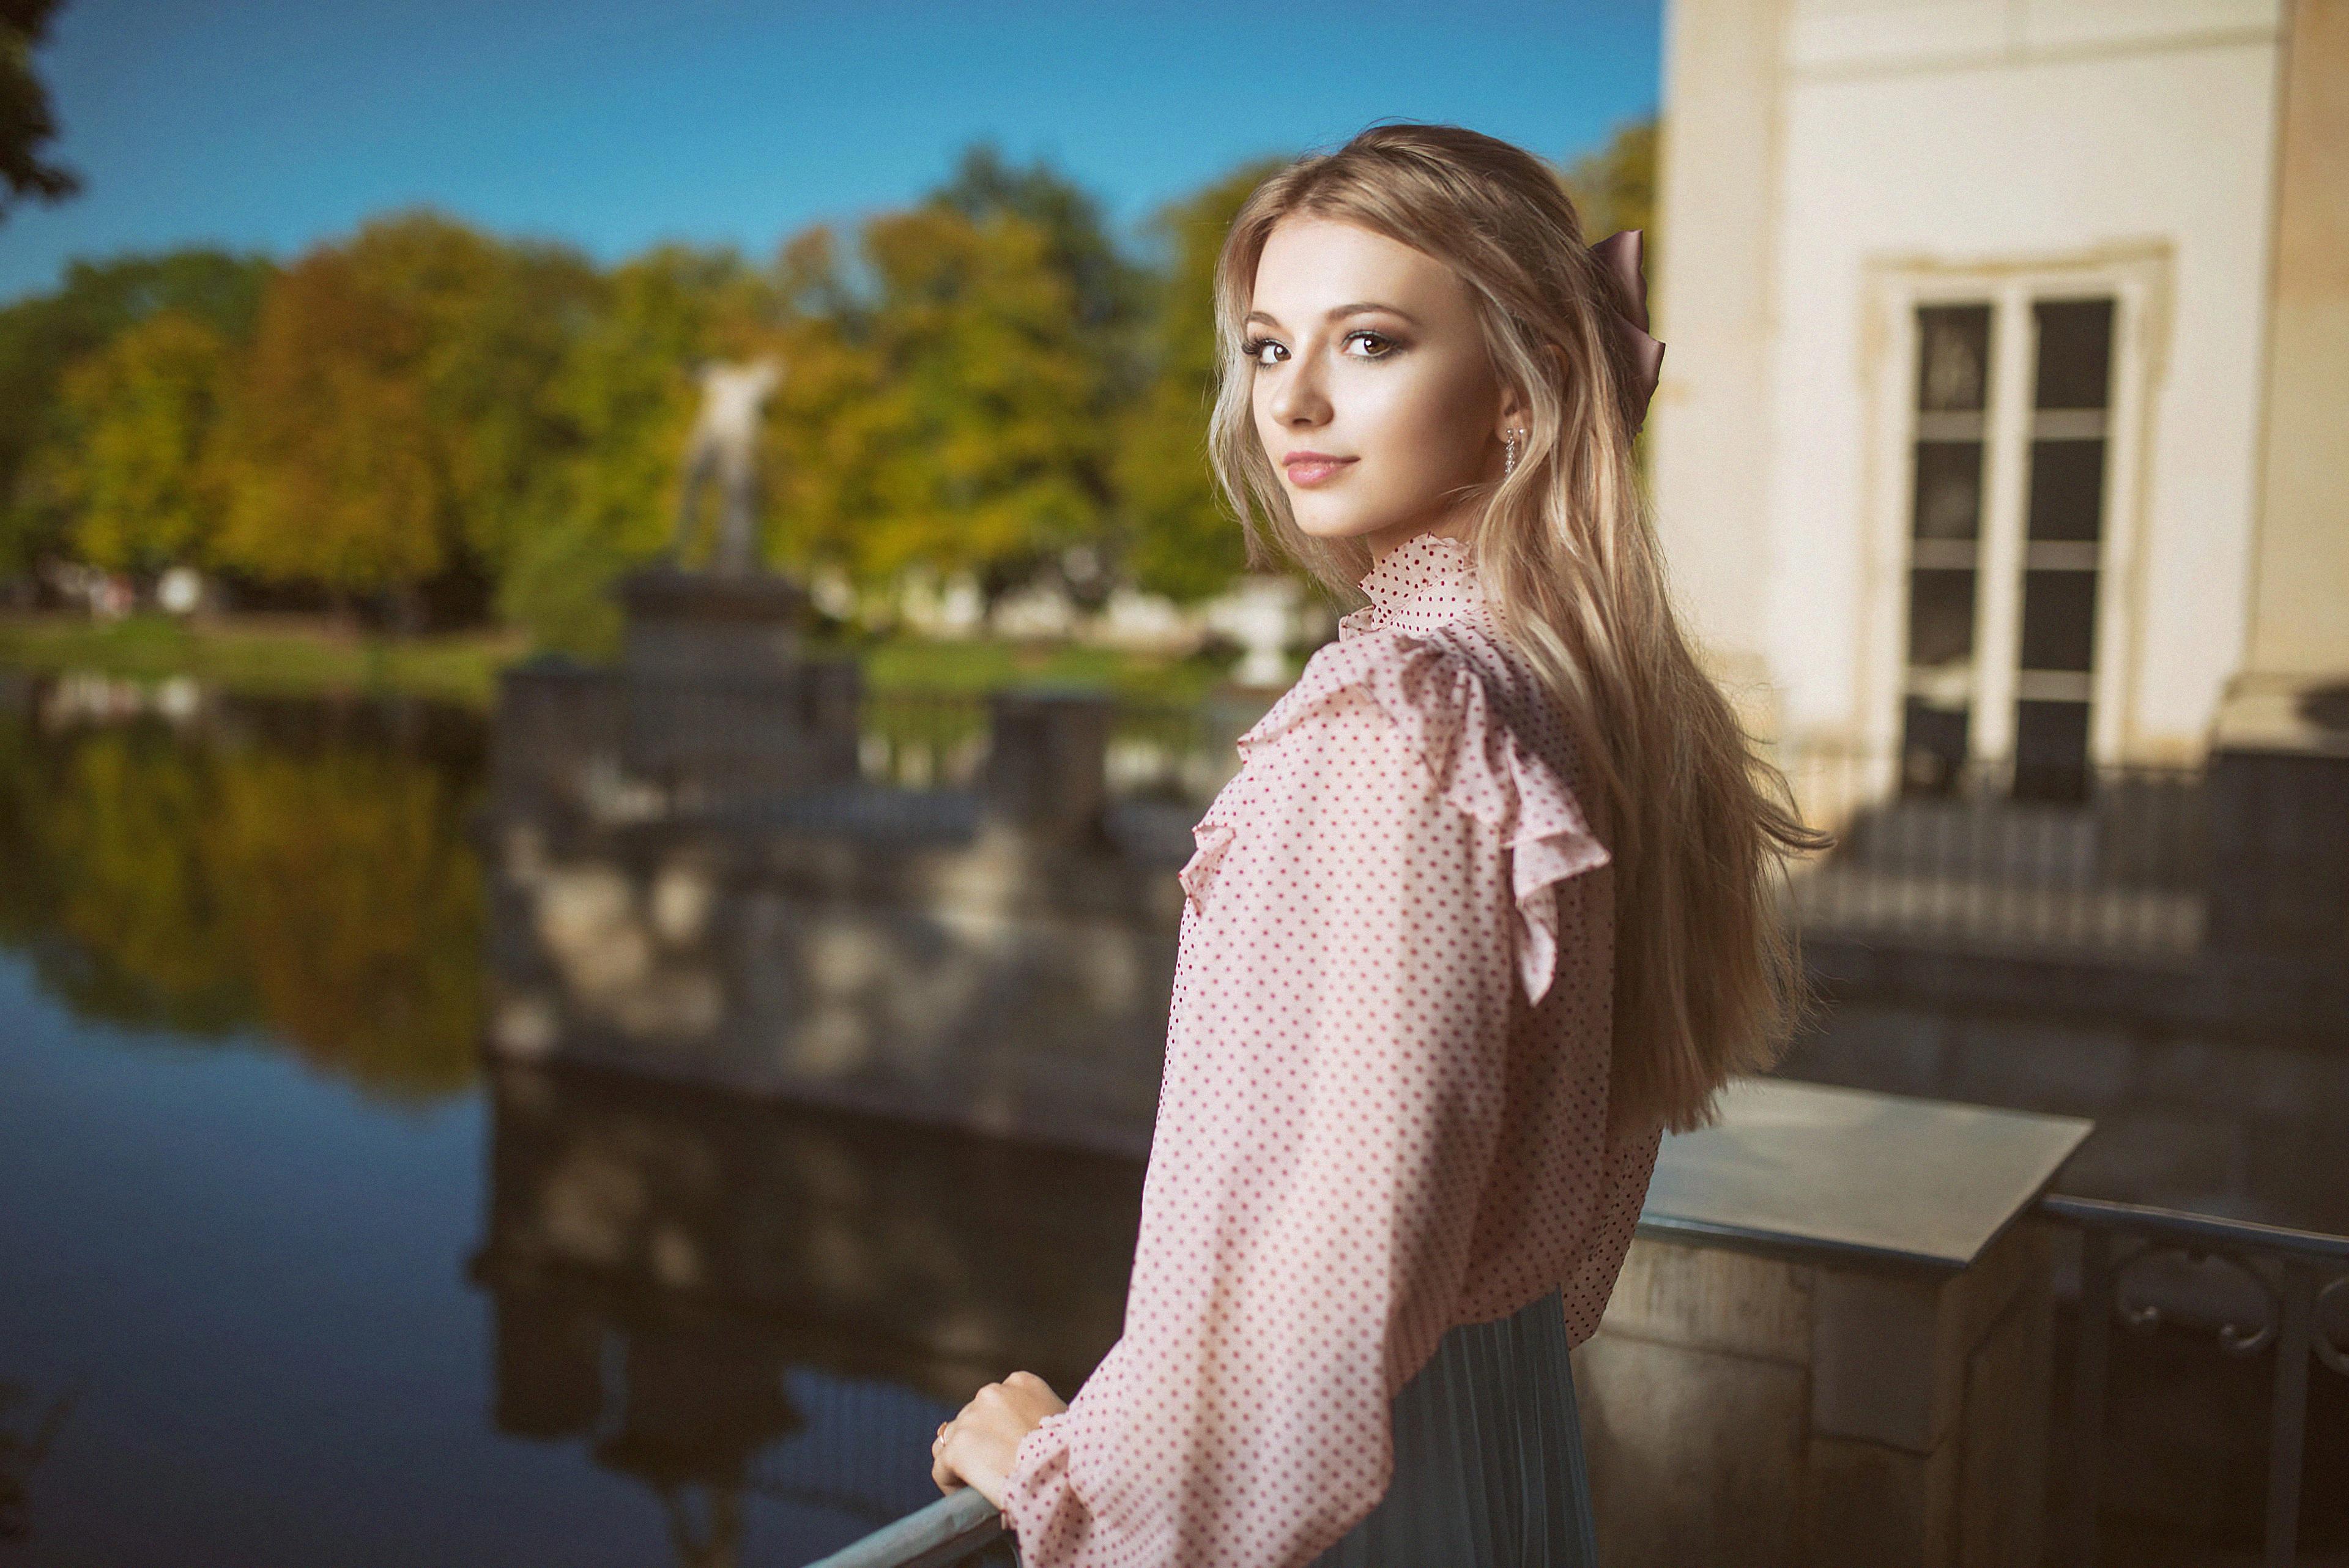 2160x3840 Blonde Attractive Girl Indoor Sony Xperia X,XZ